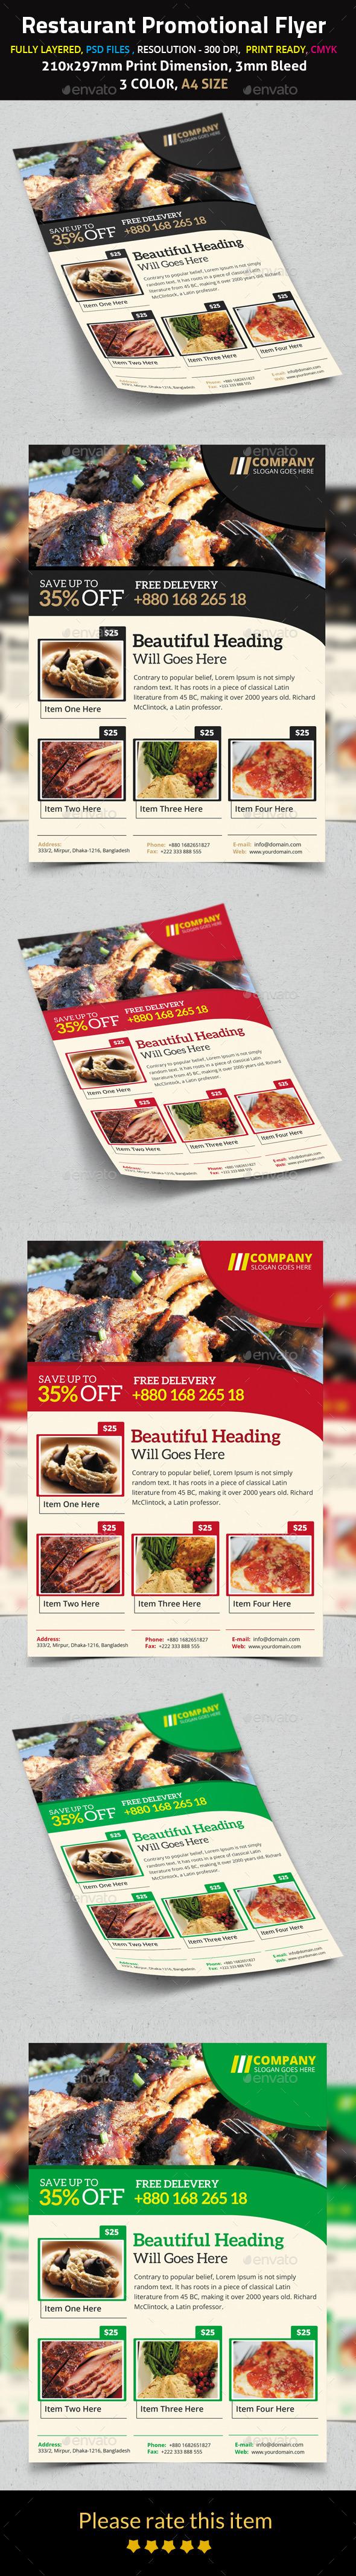 Restaurant Promotional Flyer - Restaurant Flyers